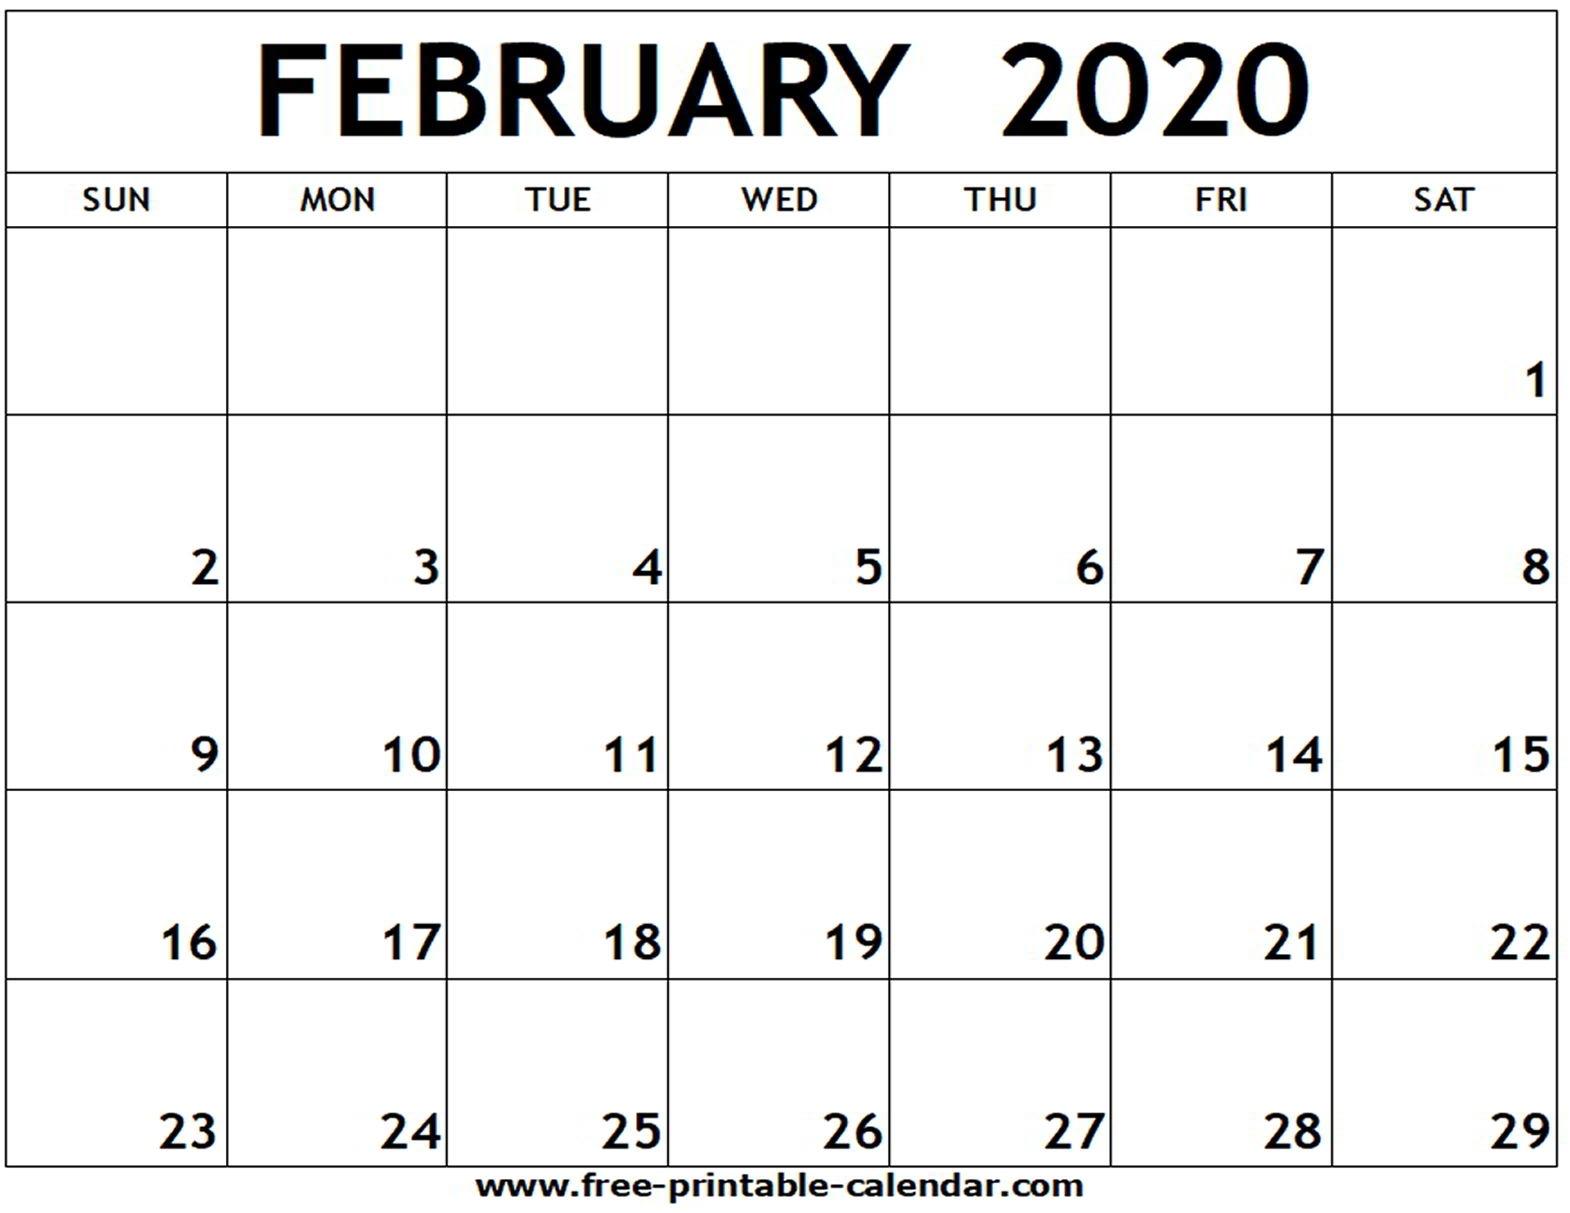 February 2020 Printable Calendar - Free-Printable-Calendar intended for 2020 Printable Fill In Calendar